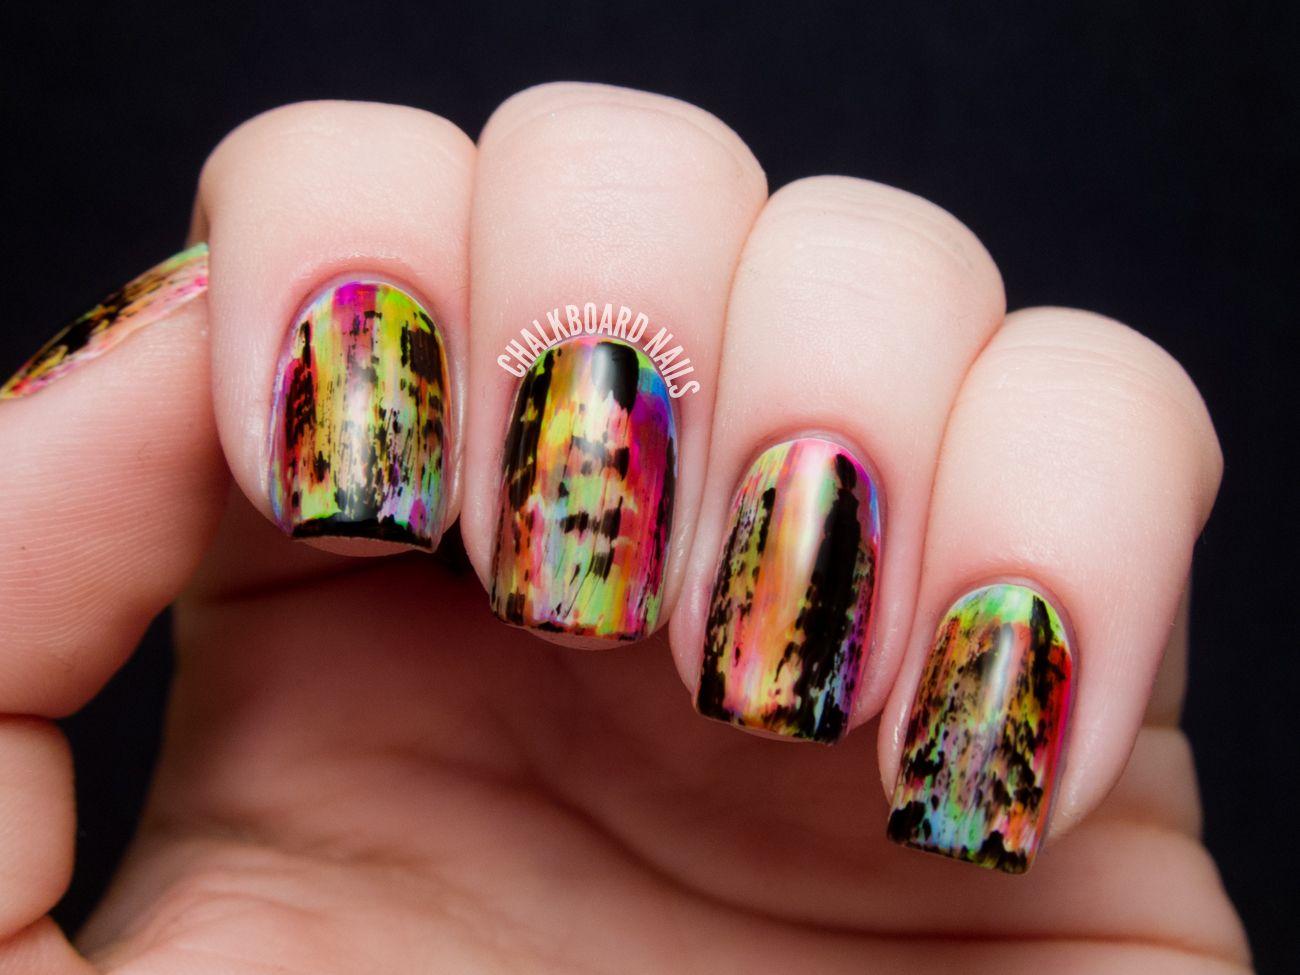 Punky Neon Grunge Nail Art Grunge Nail Art Grunge Nails And